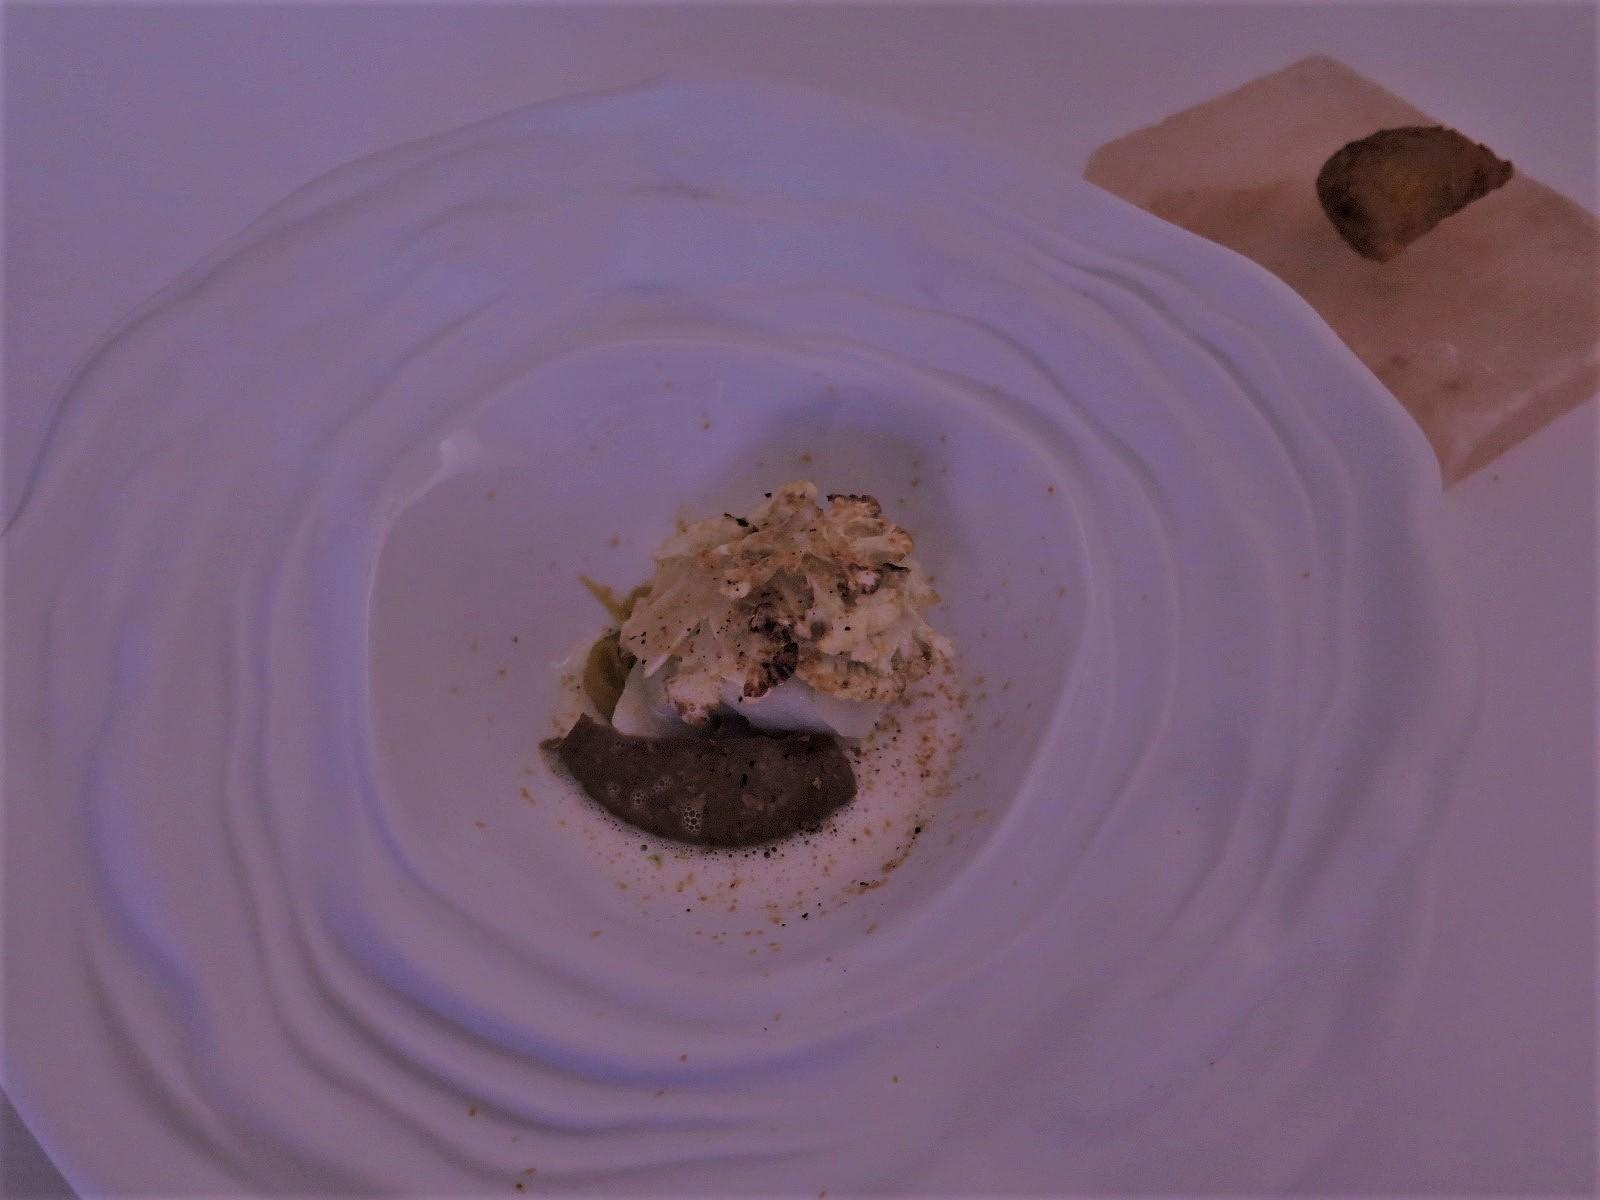 """Bacalhau salgado seco da Noruega escondido na couve-flor"" (Miguel Marques, 1.º lugar)"